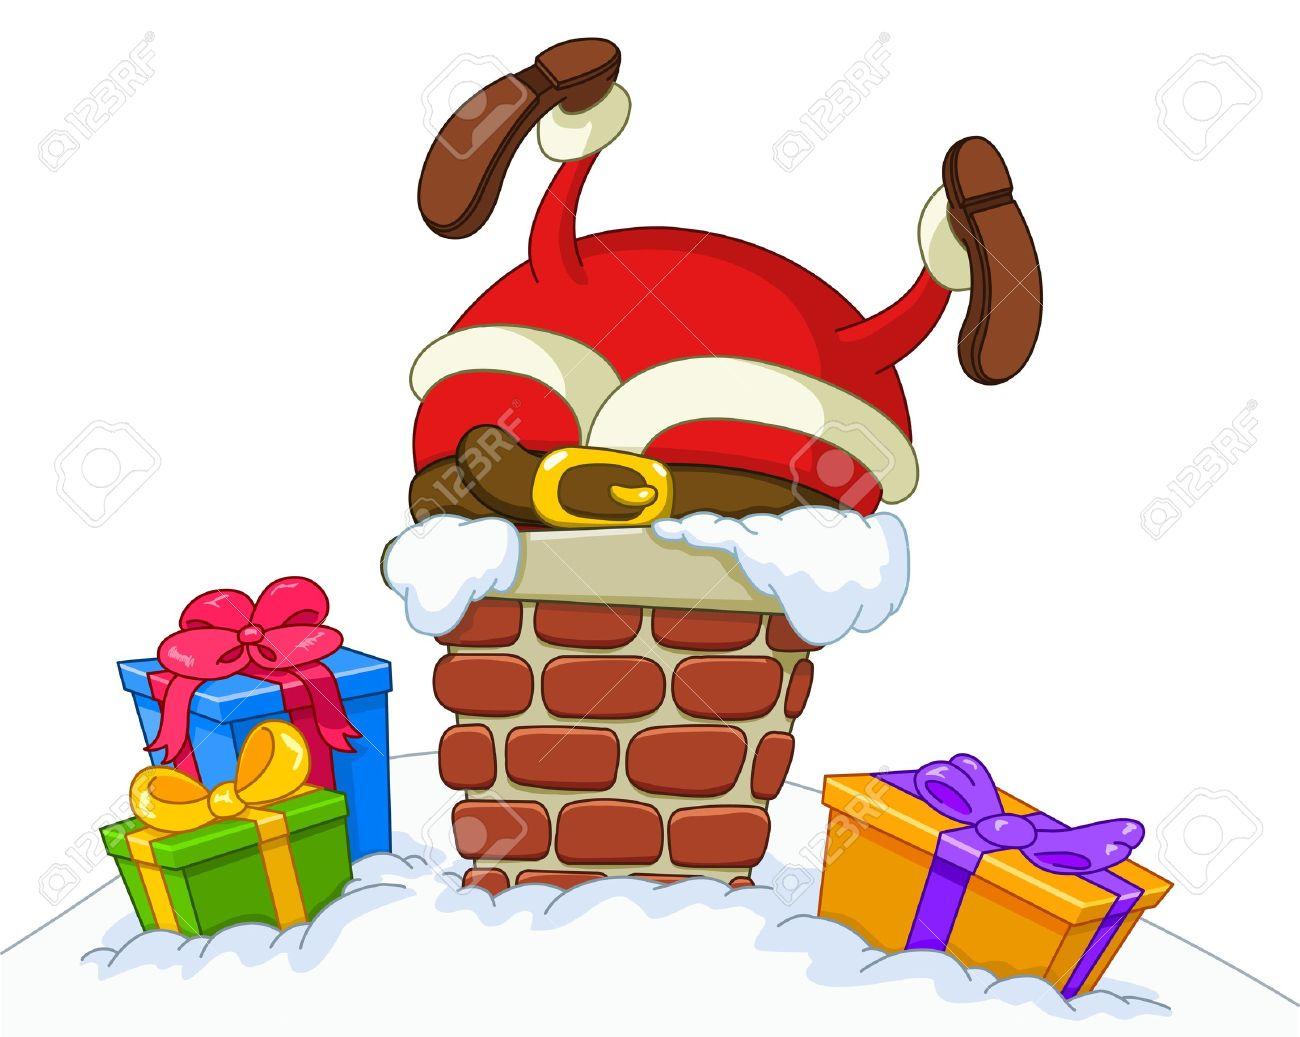 Santa Claus stuck in a chimney.